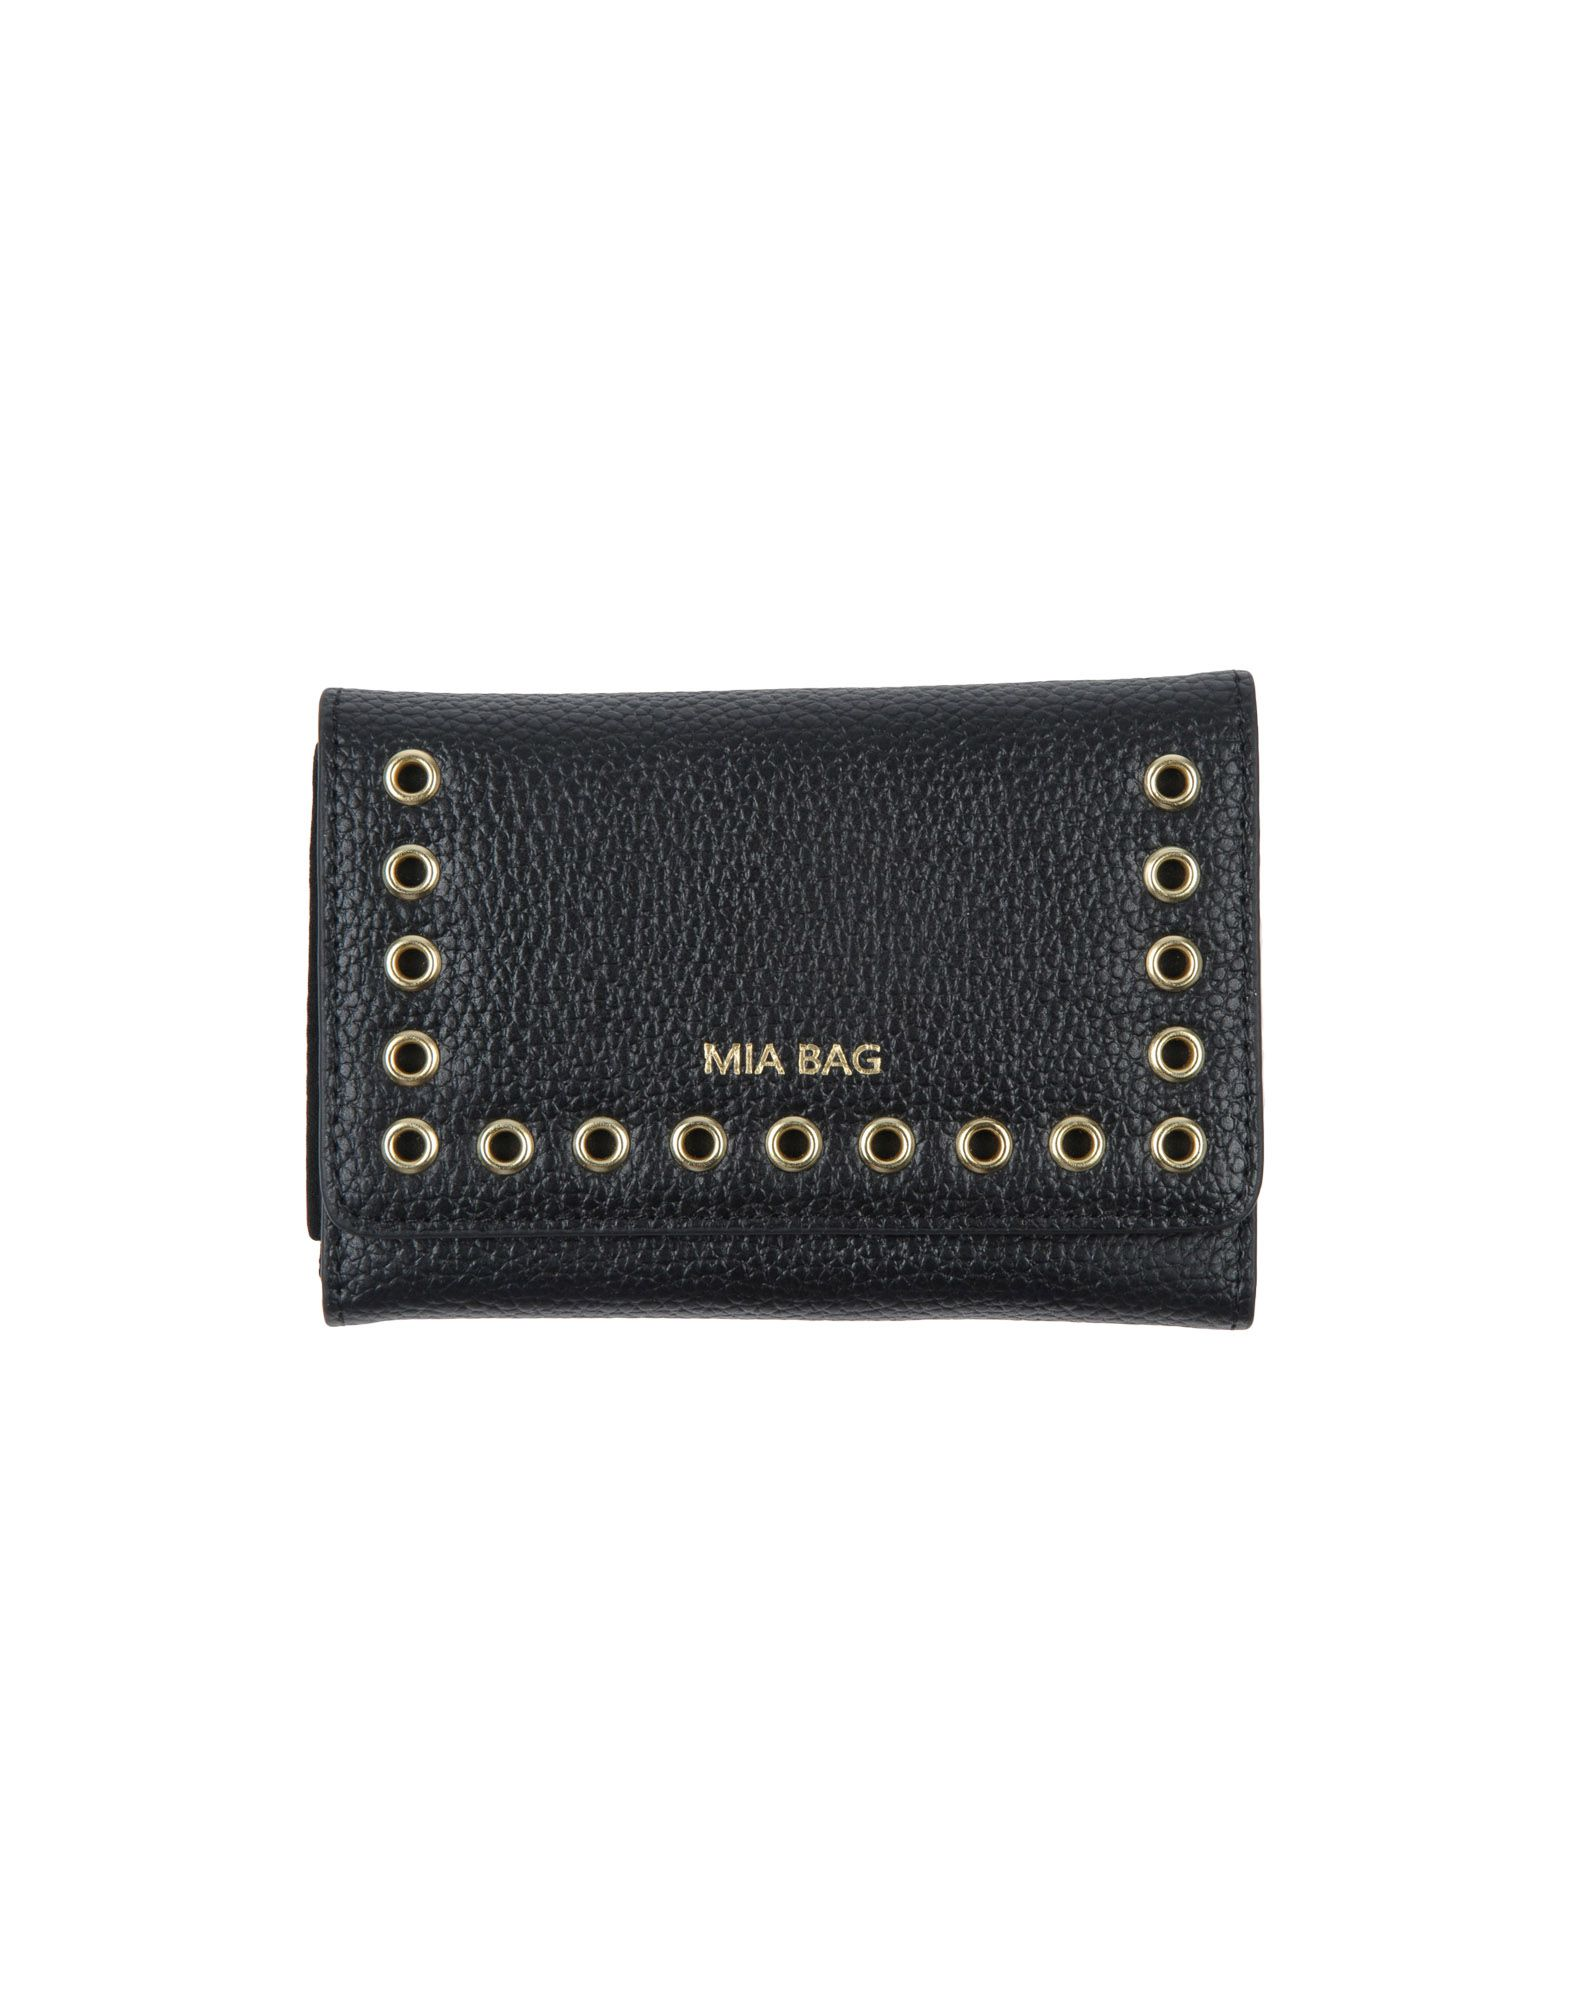 MIA BAG レディース 財布 ブラック 革